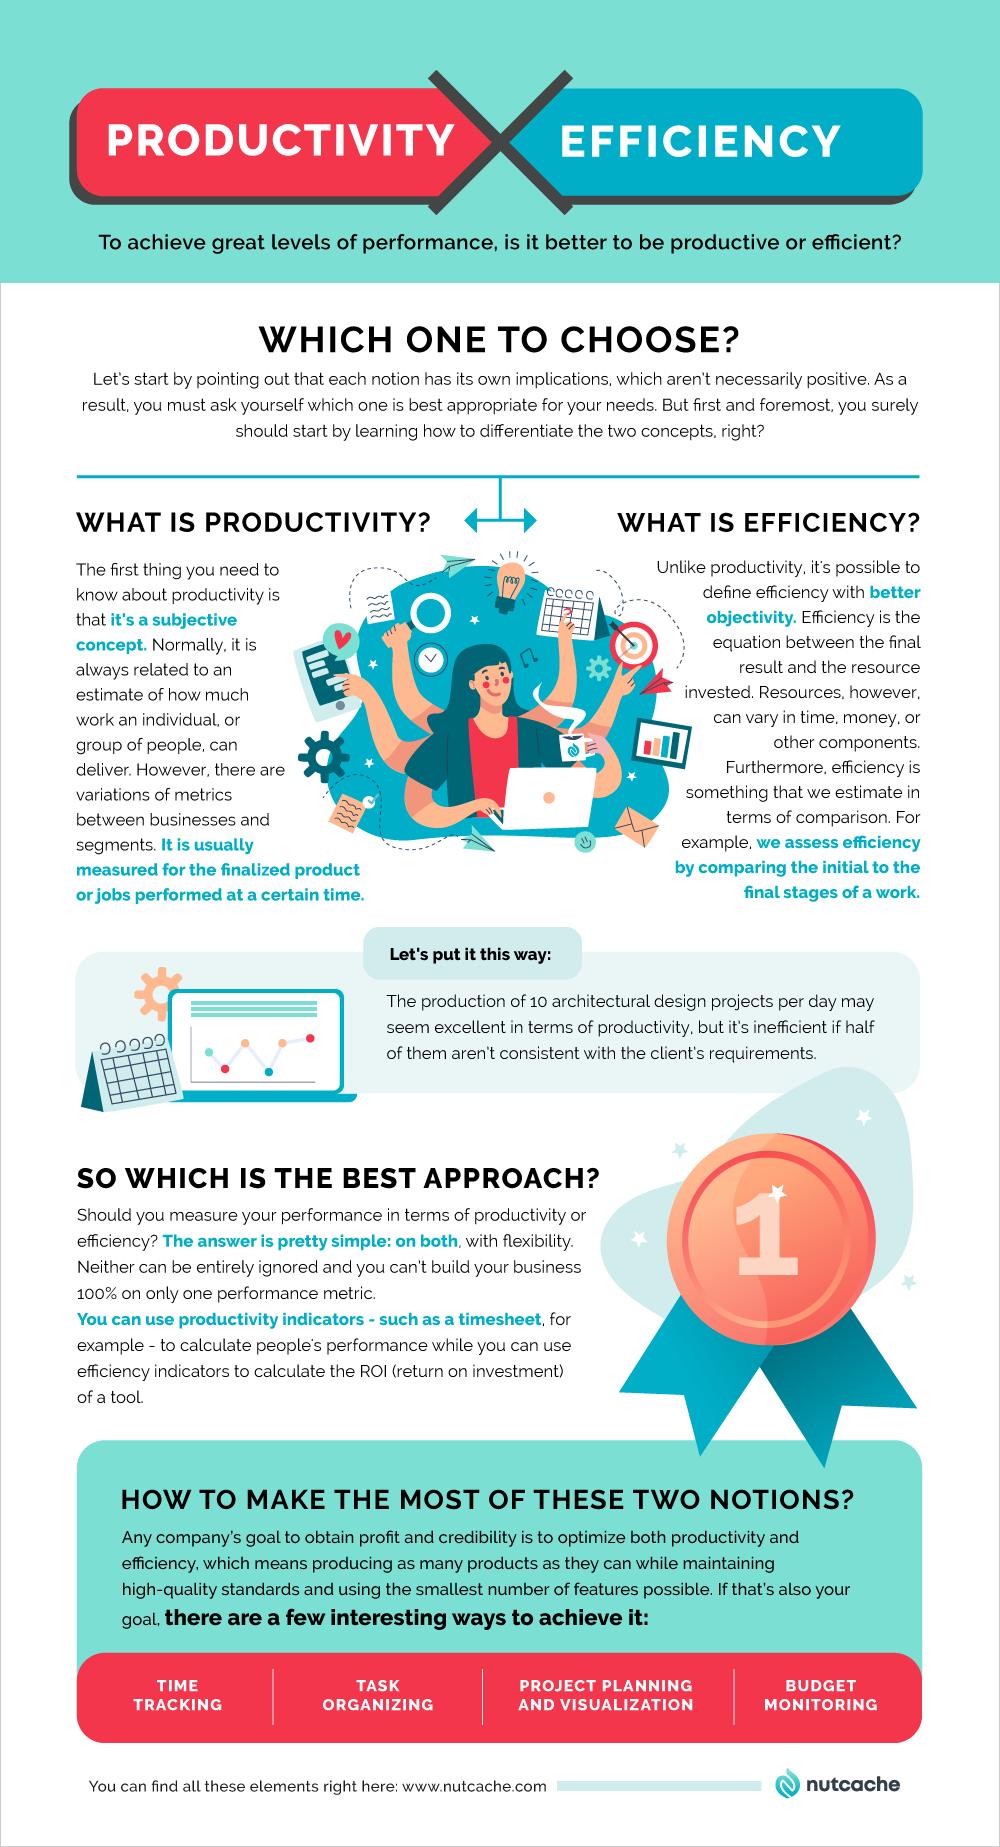 Productivity or efficiency